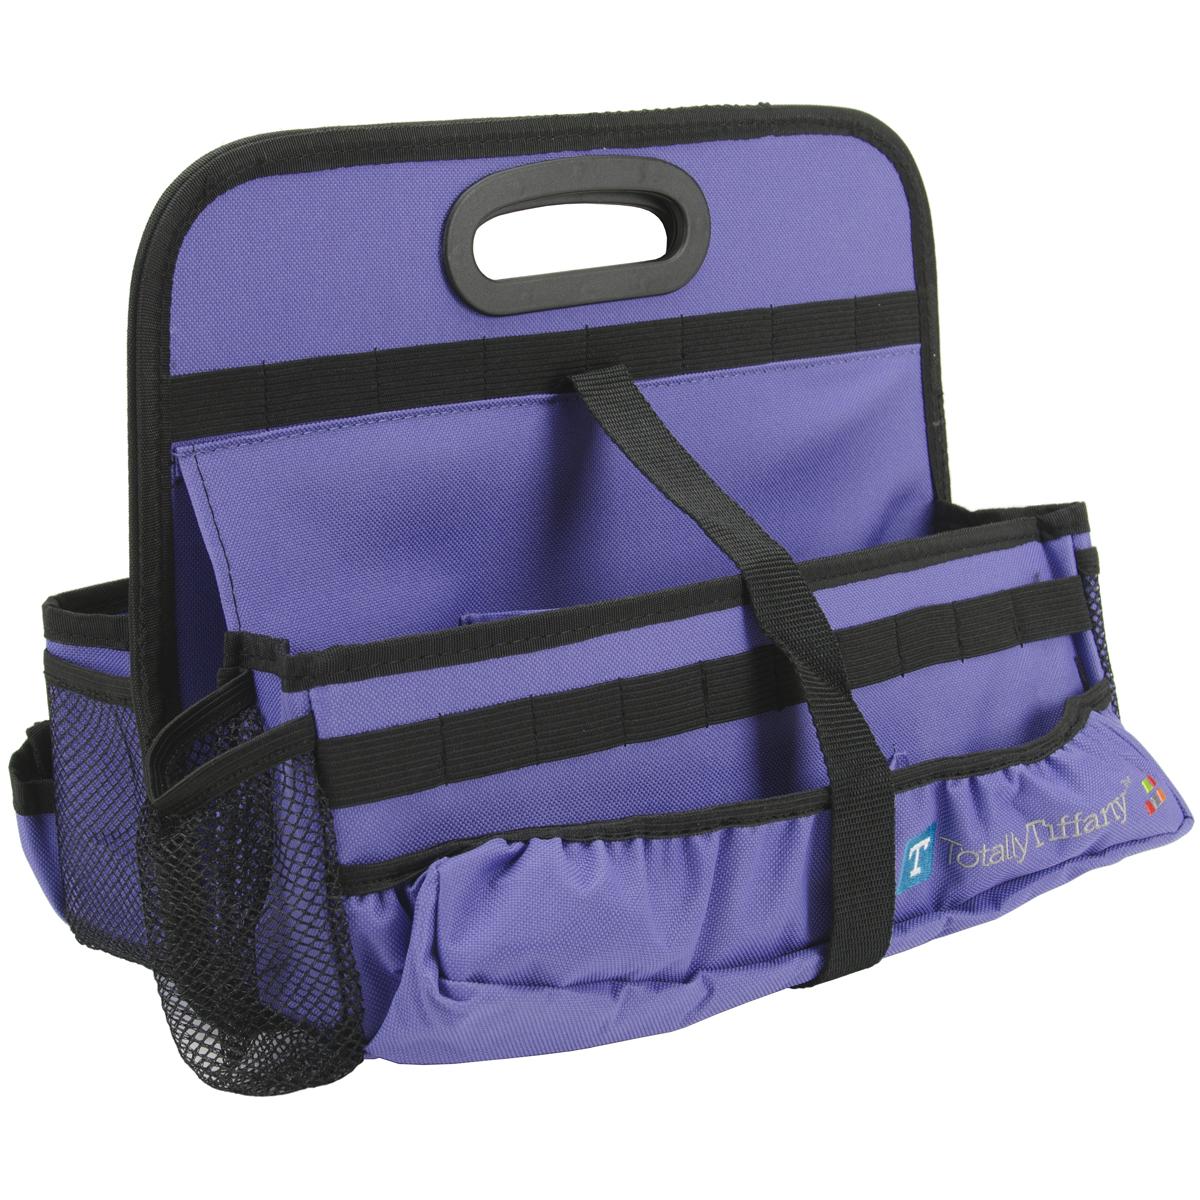 Totally-Tiffany Ditto Desktop Organizer-Purple